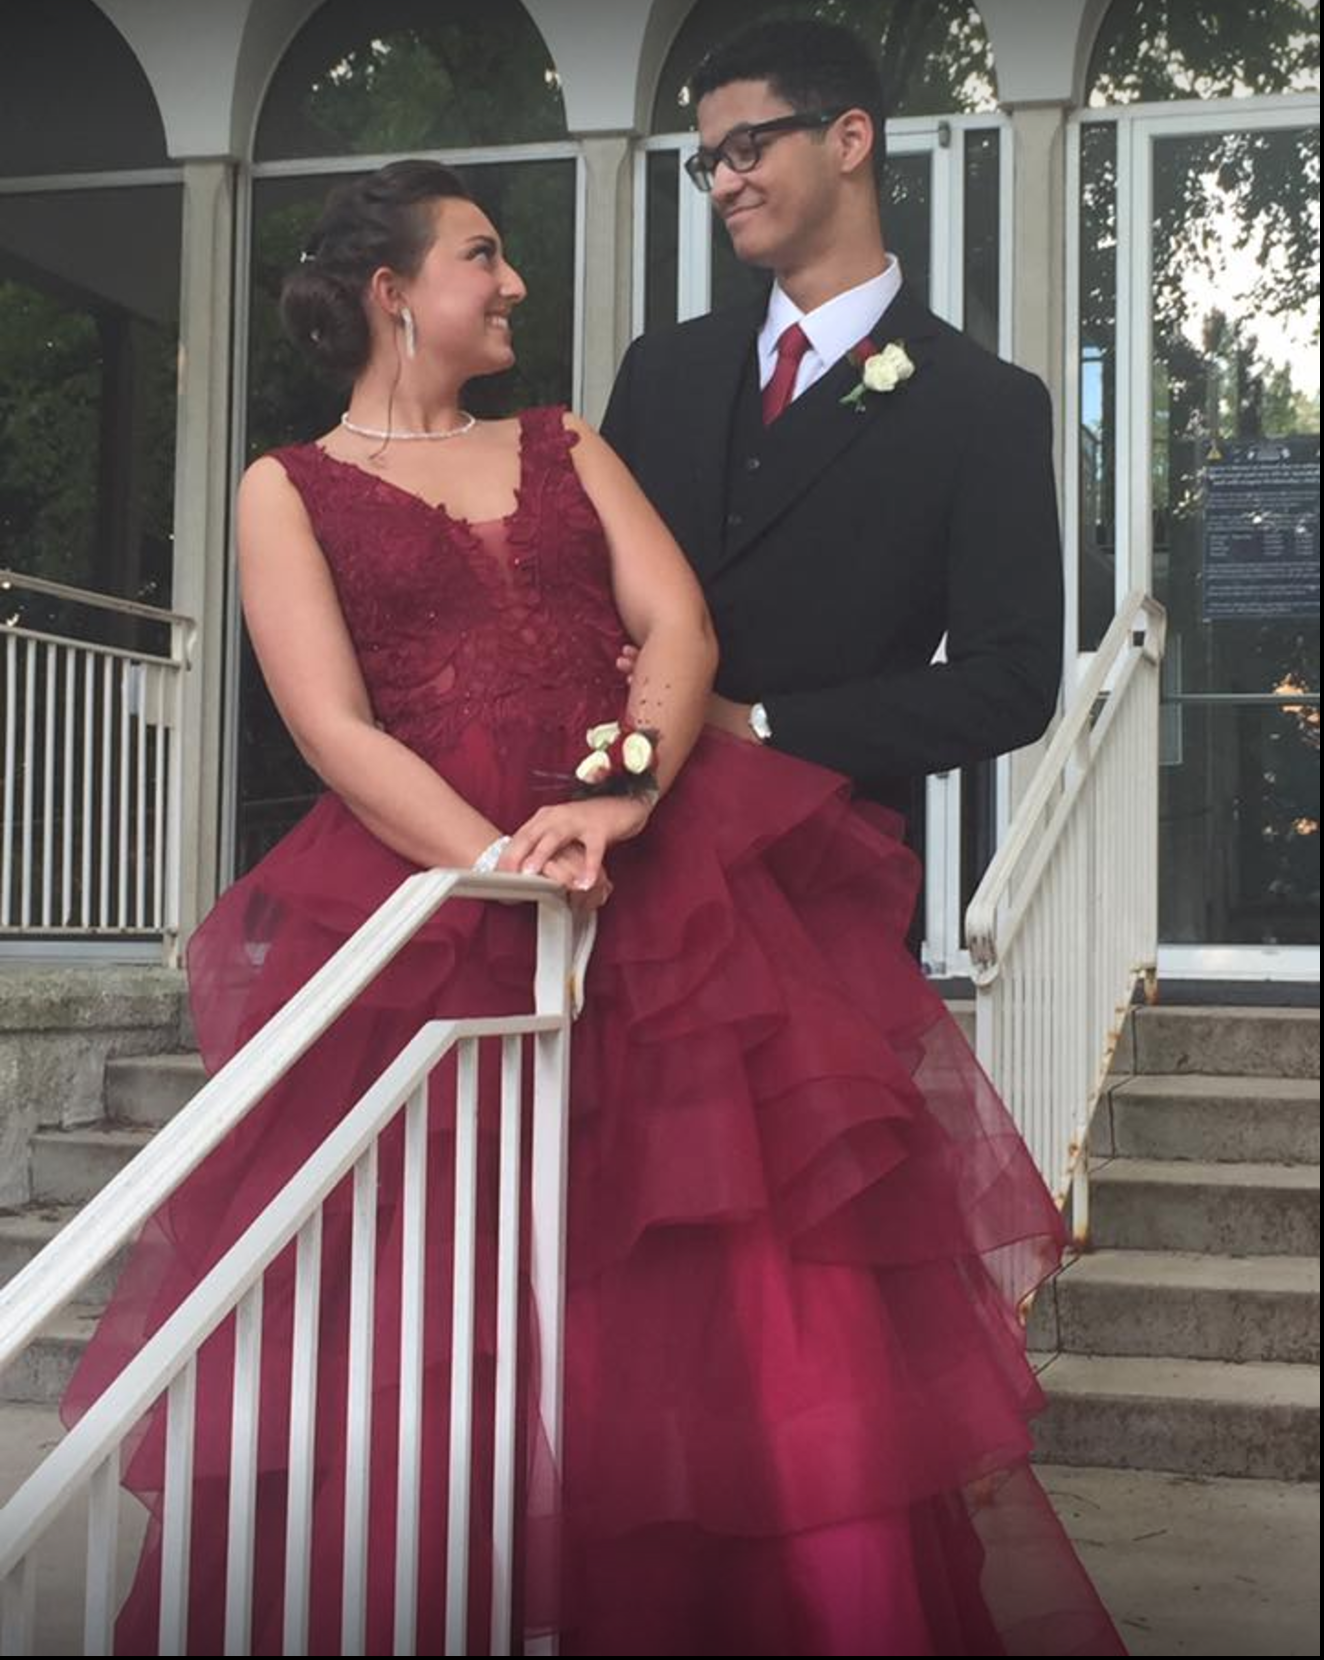 Prom King and Queen 2017 Gillespie Florists Olivia Aaron